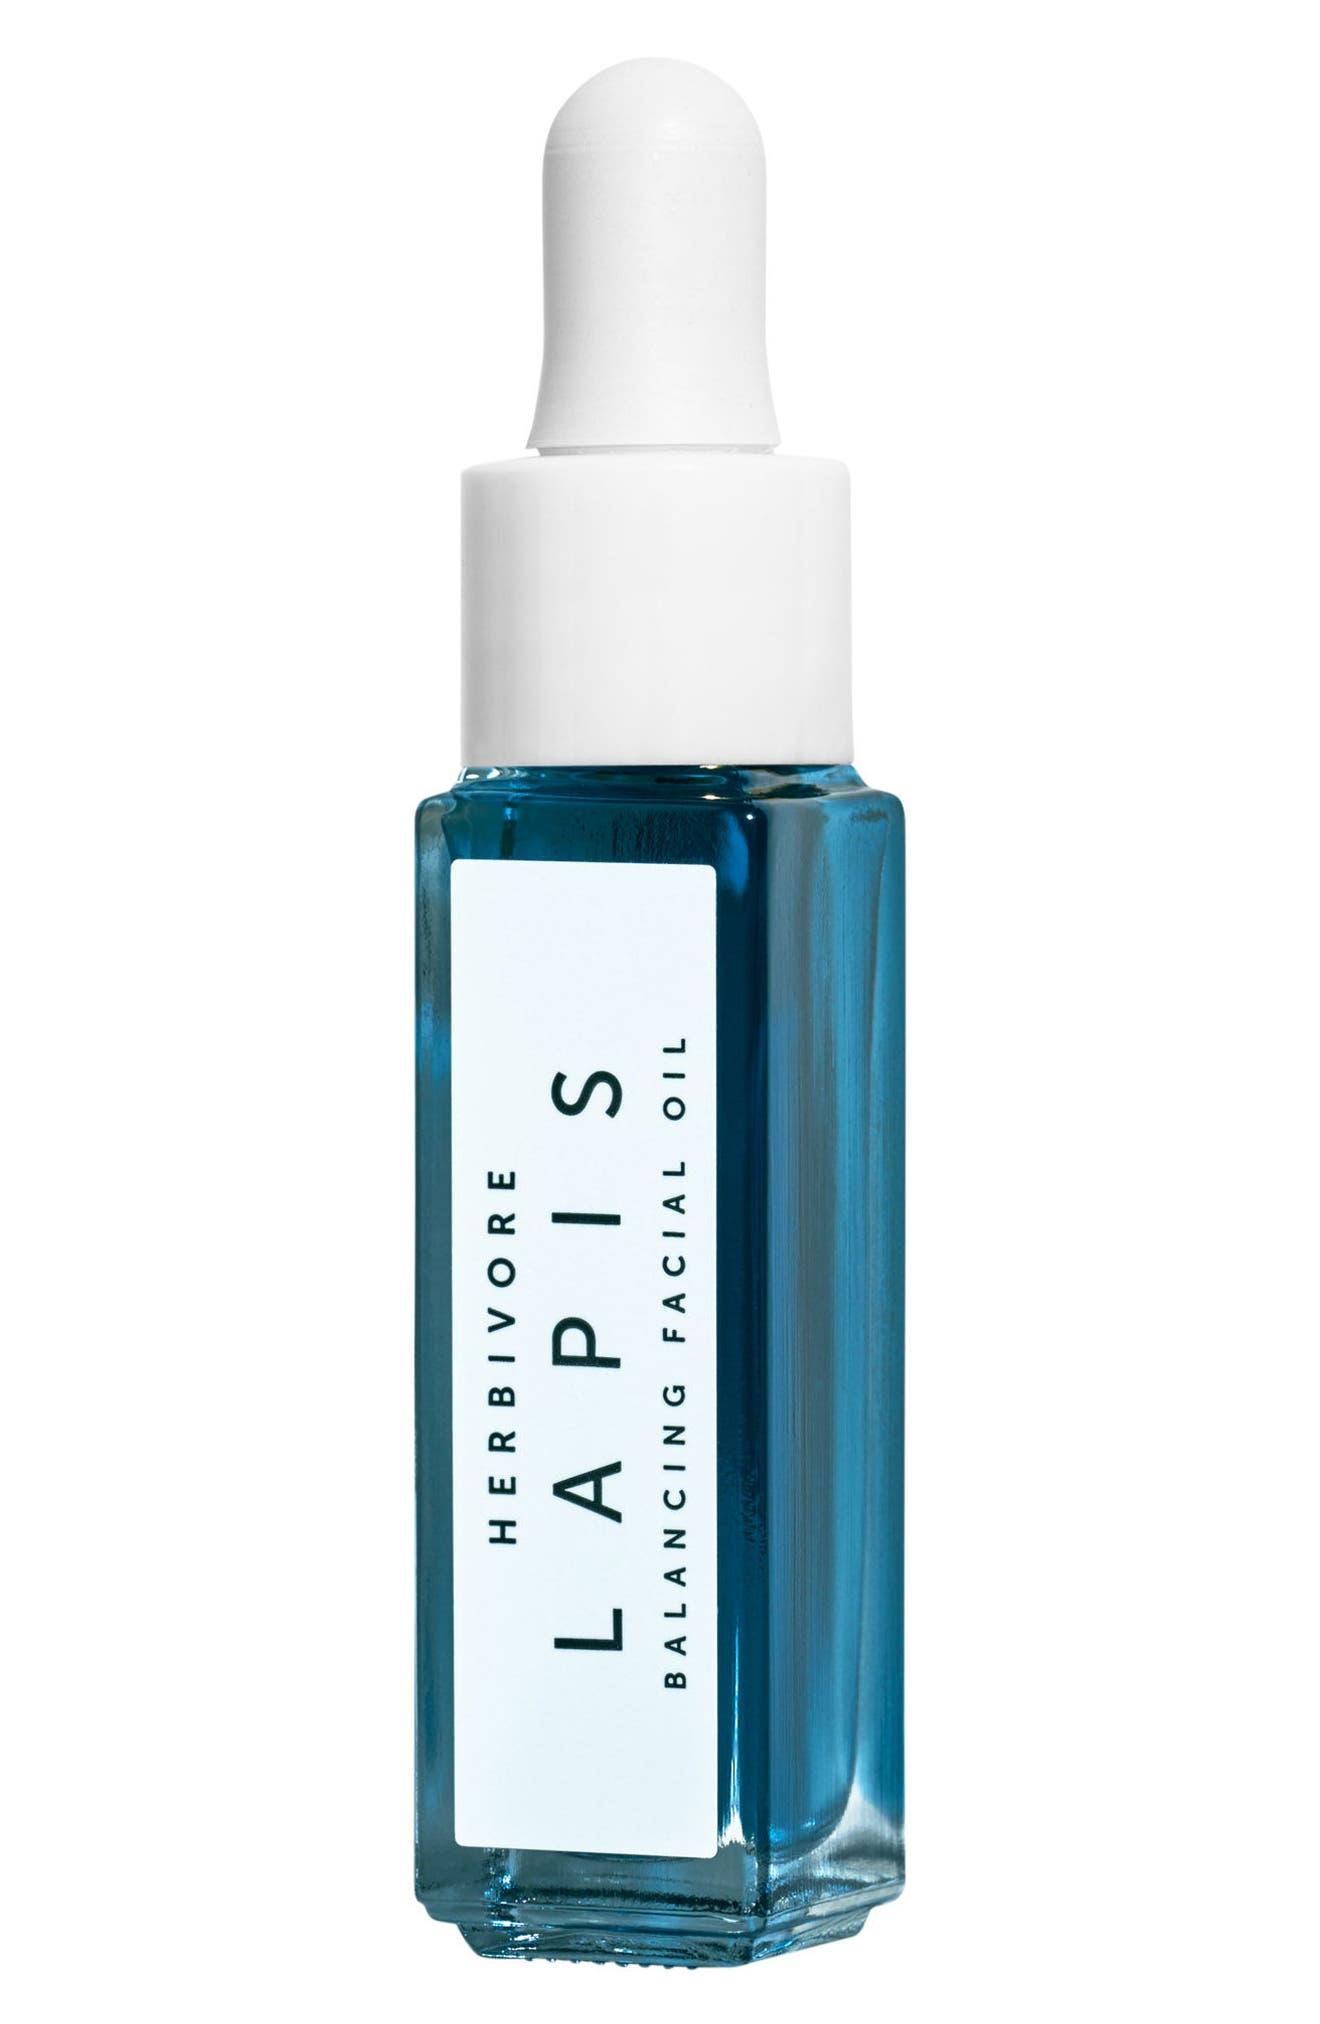 Main Image - Herbivore Botanicals 'Lapis' Facial Oil Roller